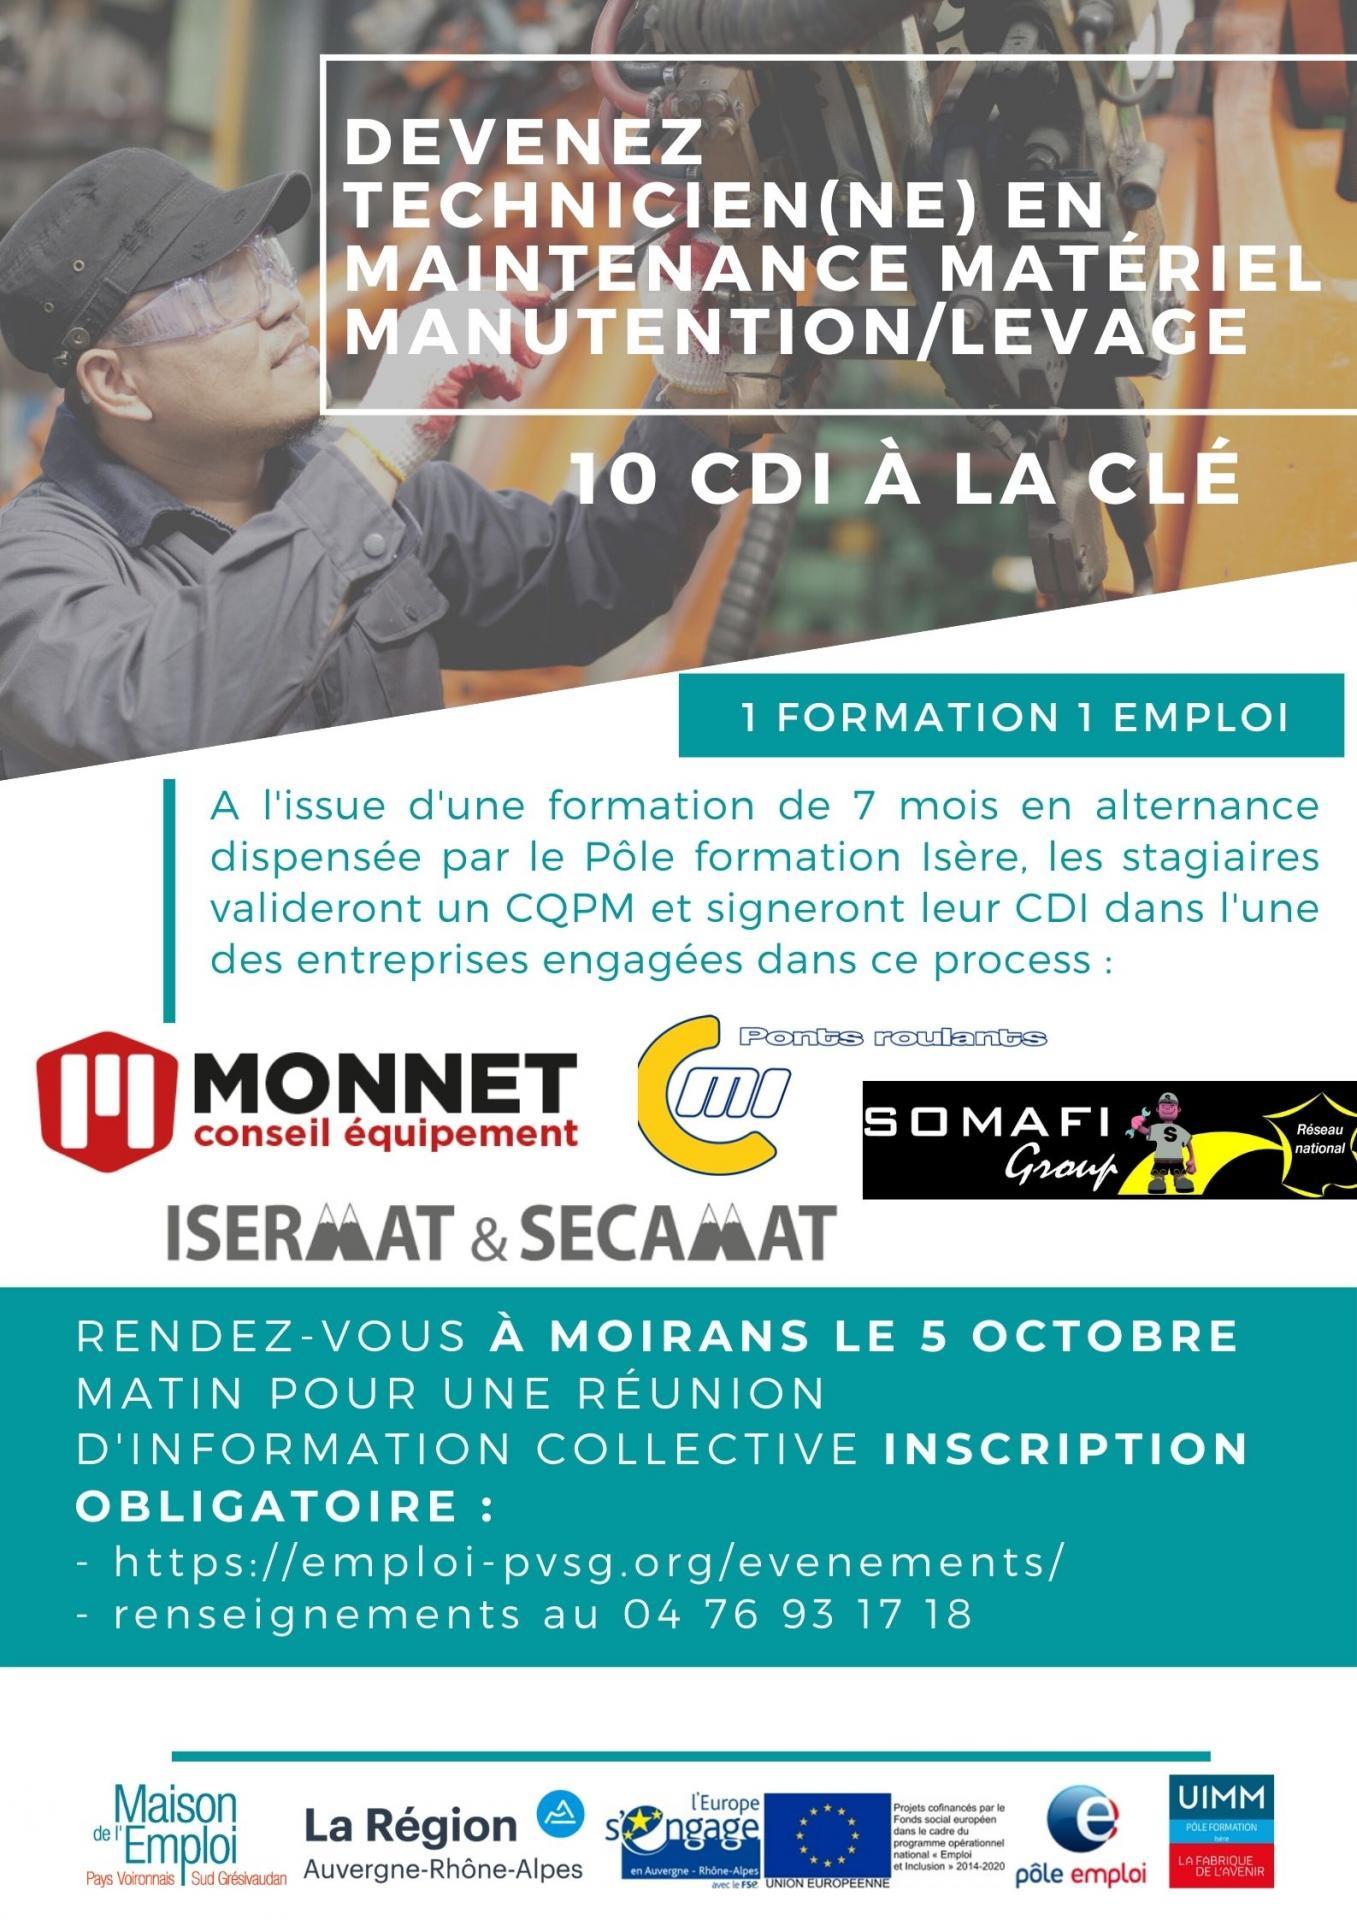 Affiche tech maintenance engin levagemanutention moirans